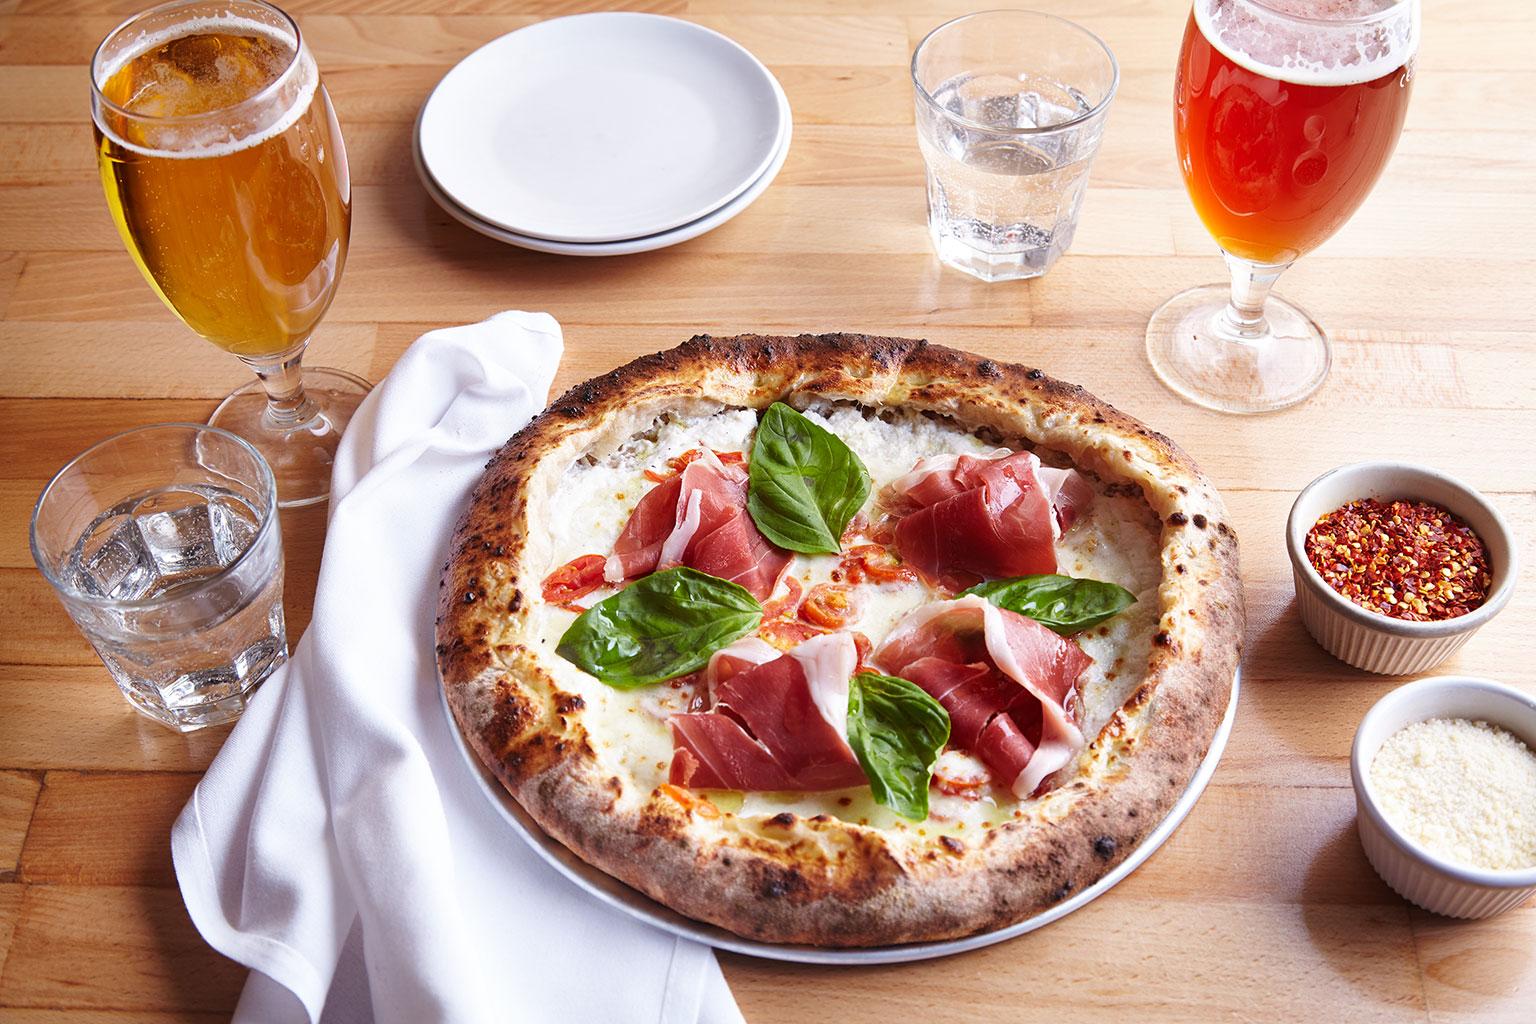 GB_FR_27_Food_Pizza3_424.jpg